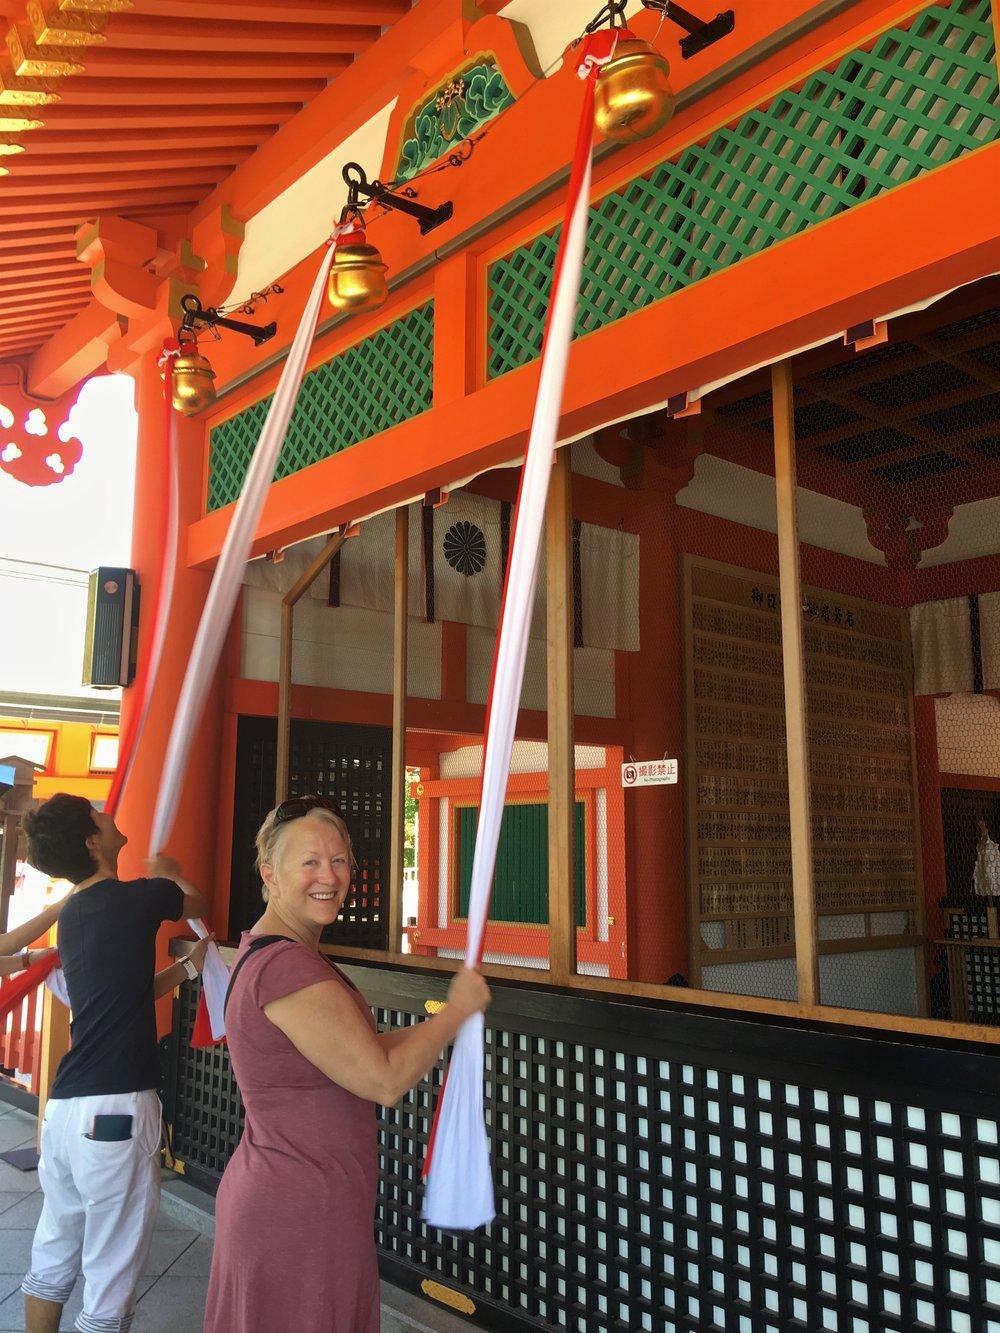 teri_Japan_Kyoto_FushimiInariTaisha_spiritedtable_photo09.jpg